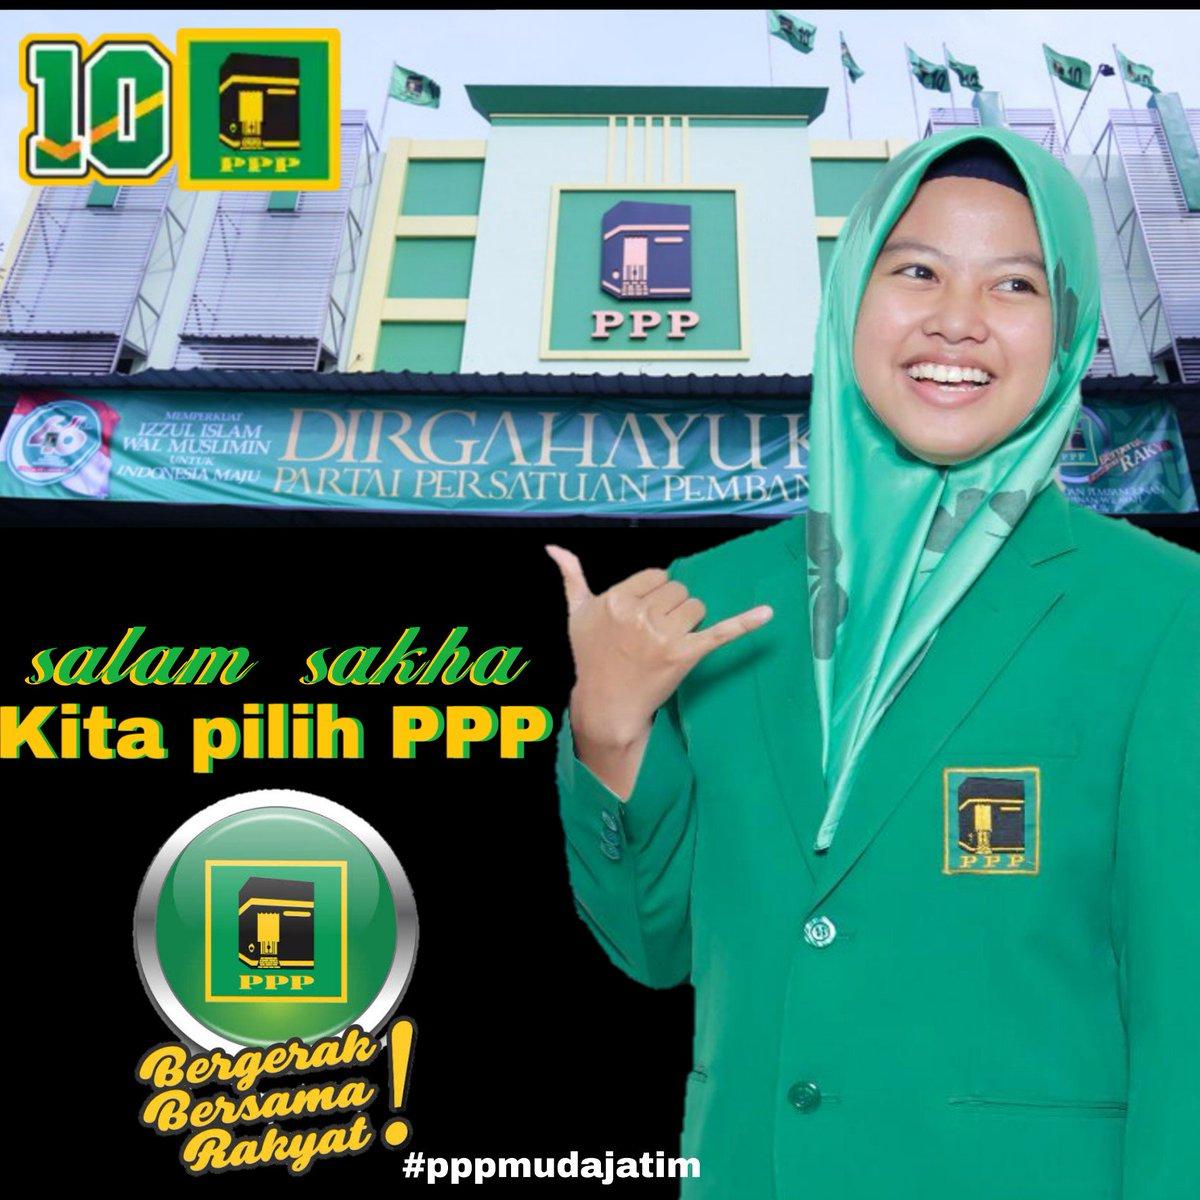 #pppmudajatim #pppmudakabpas #pppmudaindonesia #pppmudakabupatenpasuruan  #PPP10Sempurna  #PPP